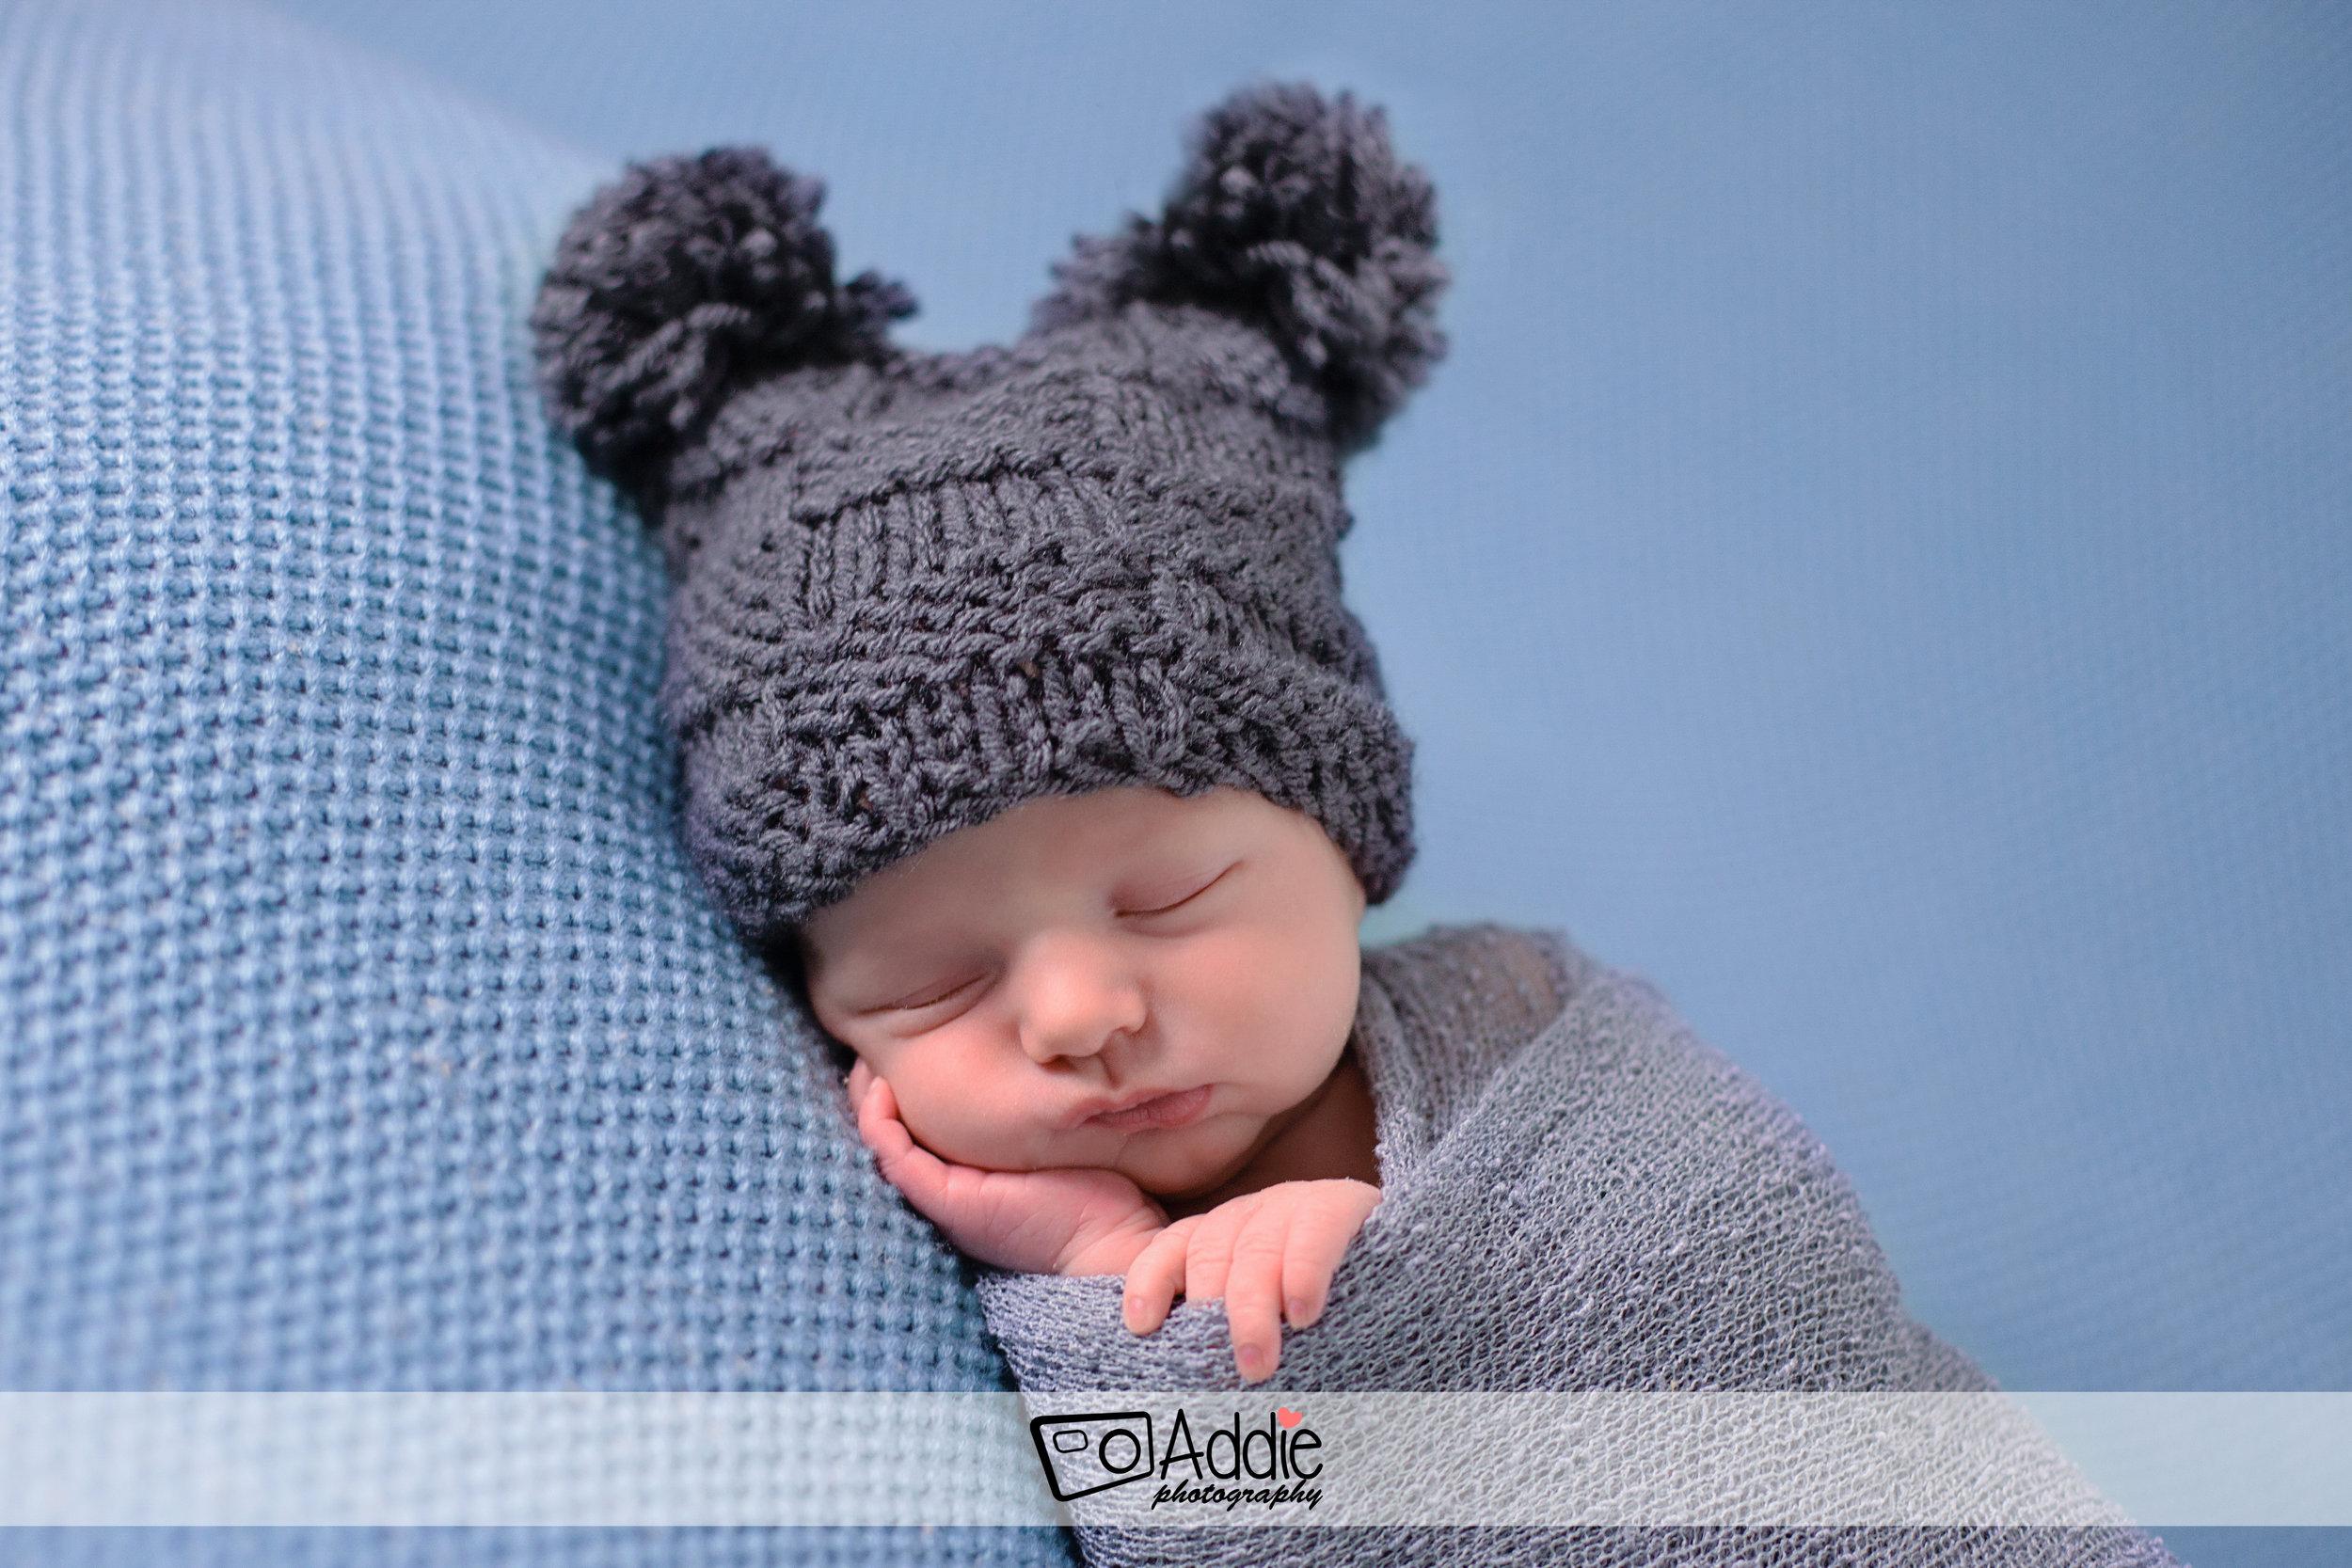 baby inman.jpg